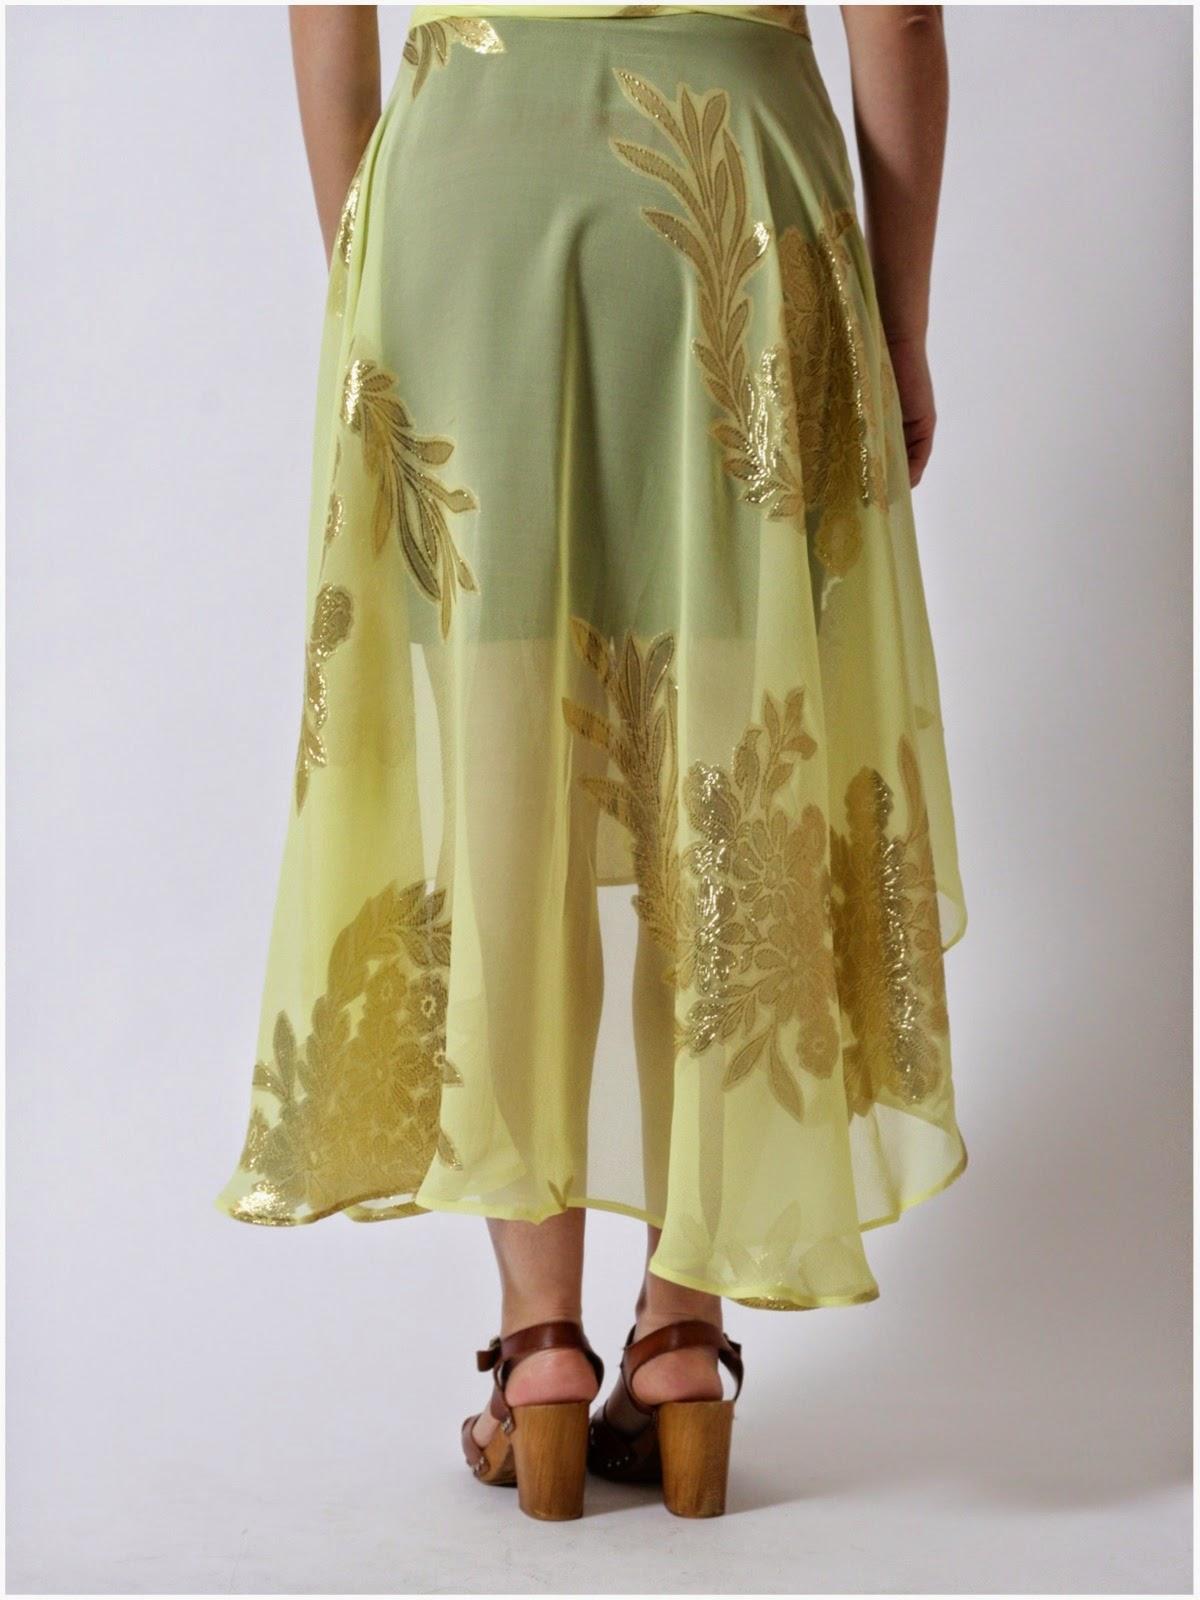 Julia Bobbin - Cascade Skirt by Megan Nielsen Patterns